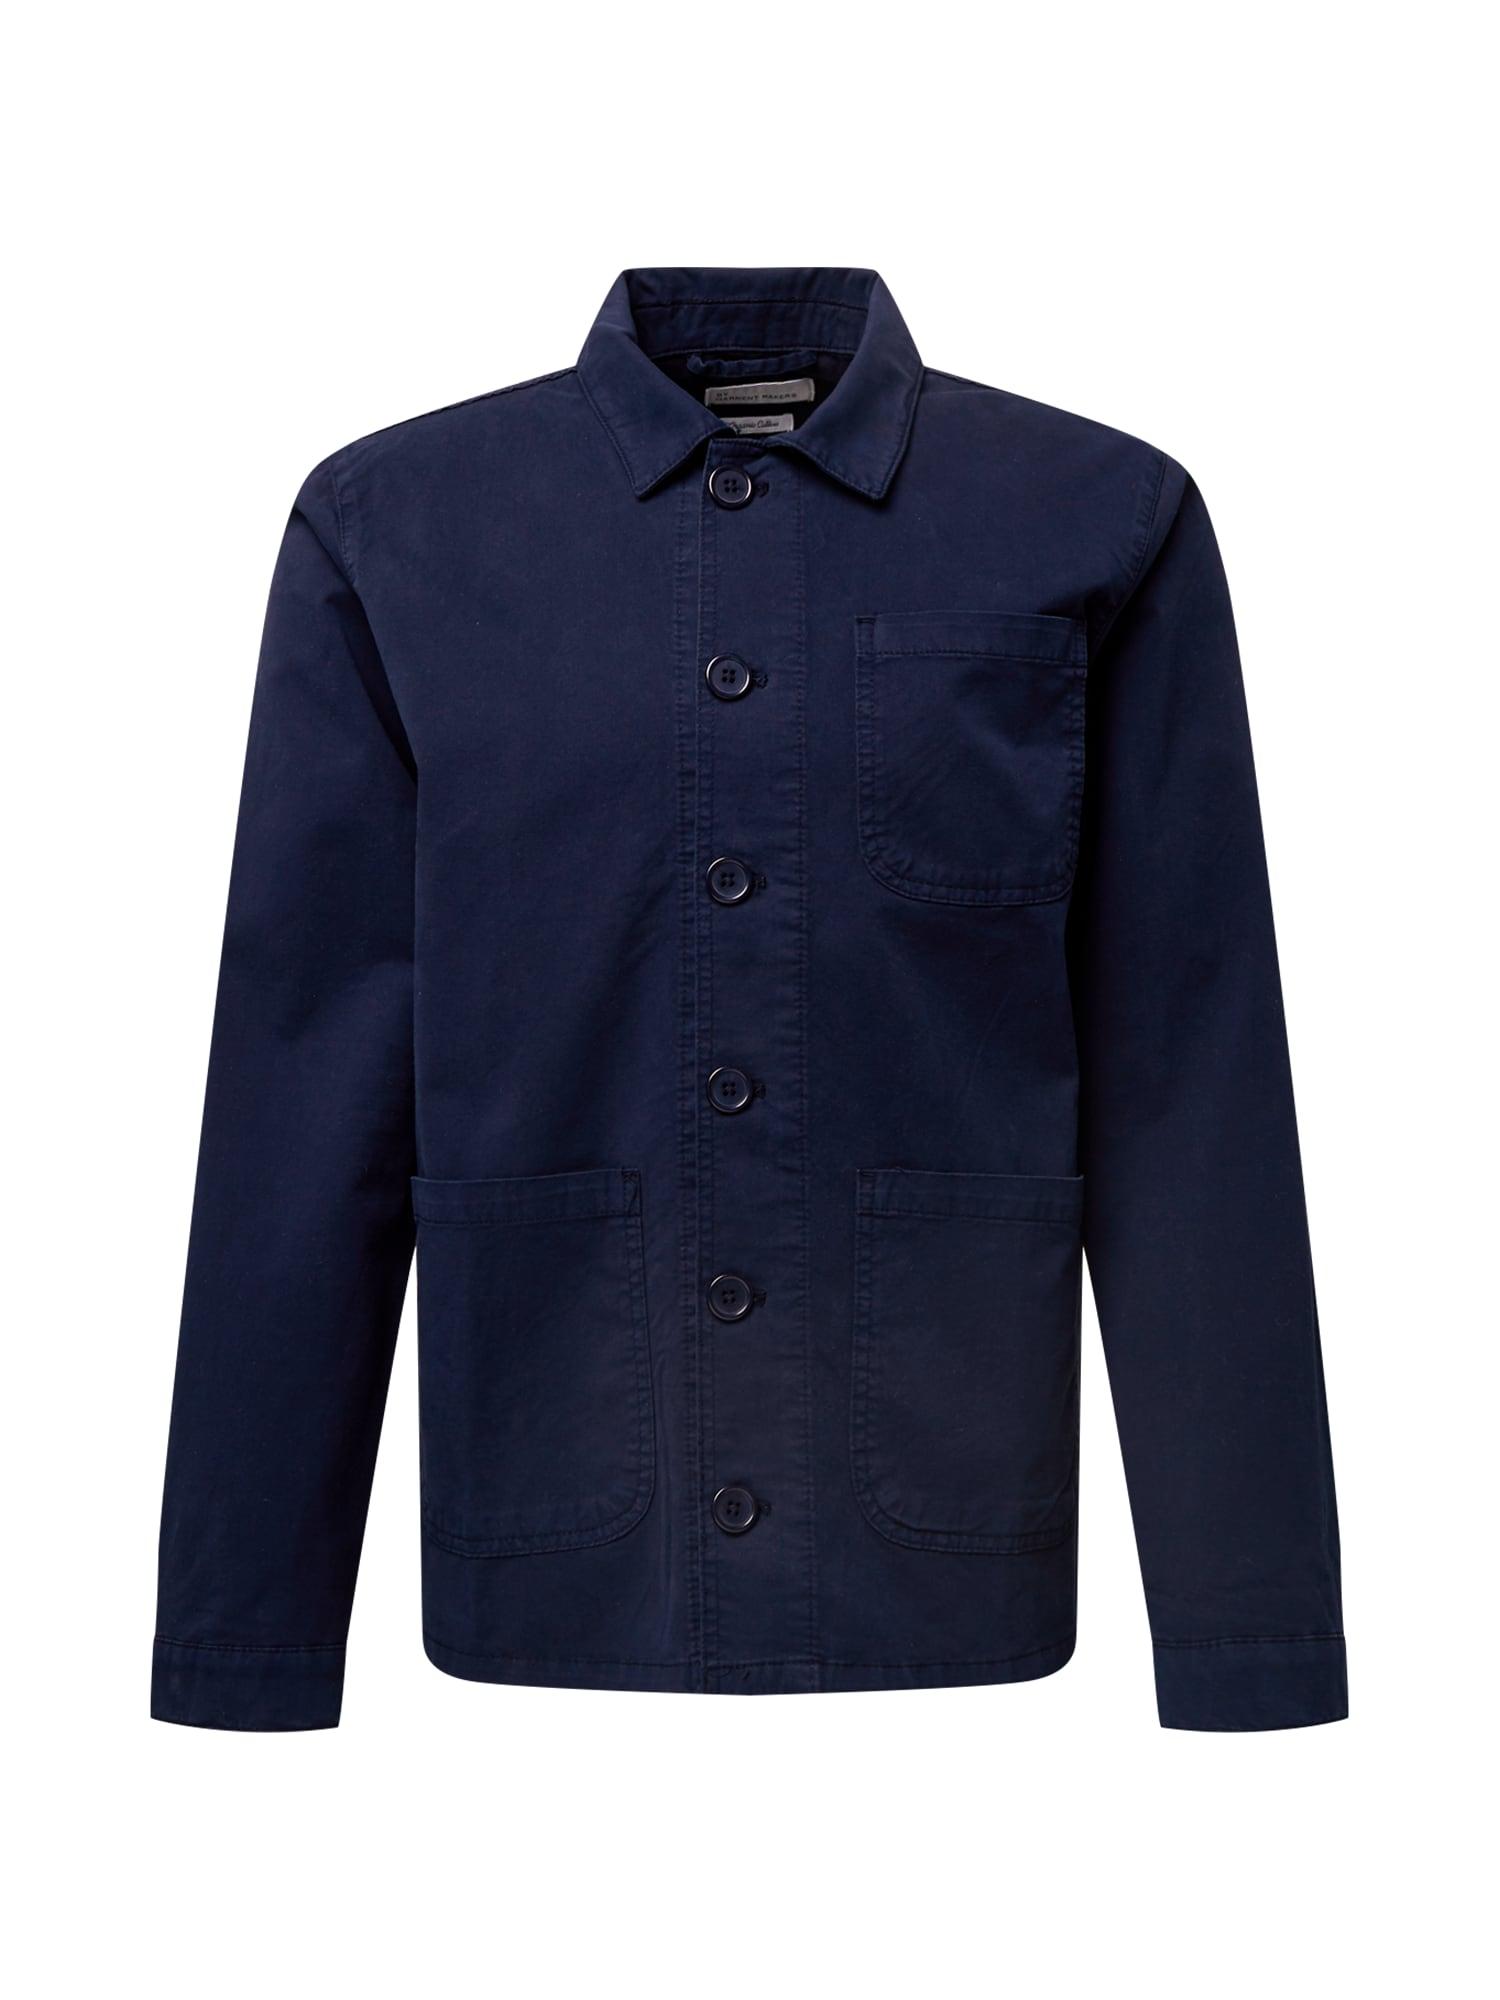 By Garment Makers Demisezoninė striukė tamsiai mėlyna